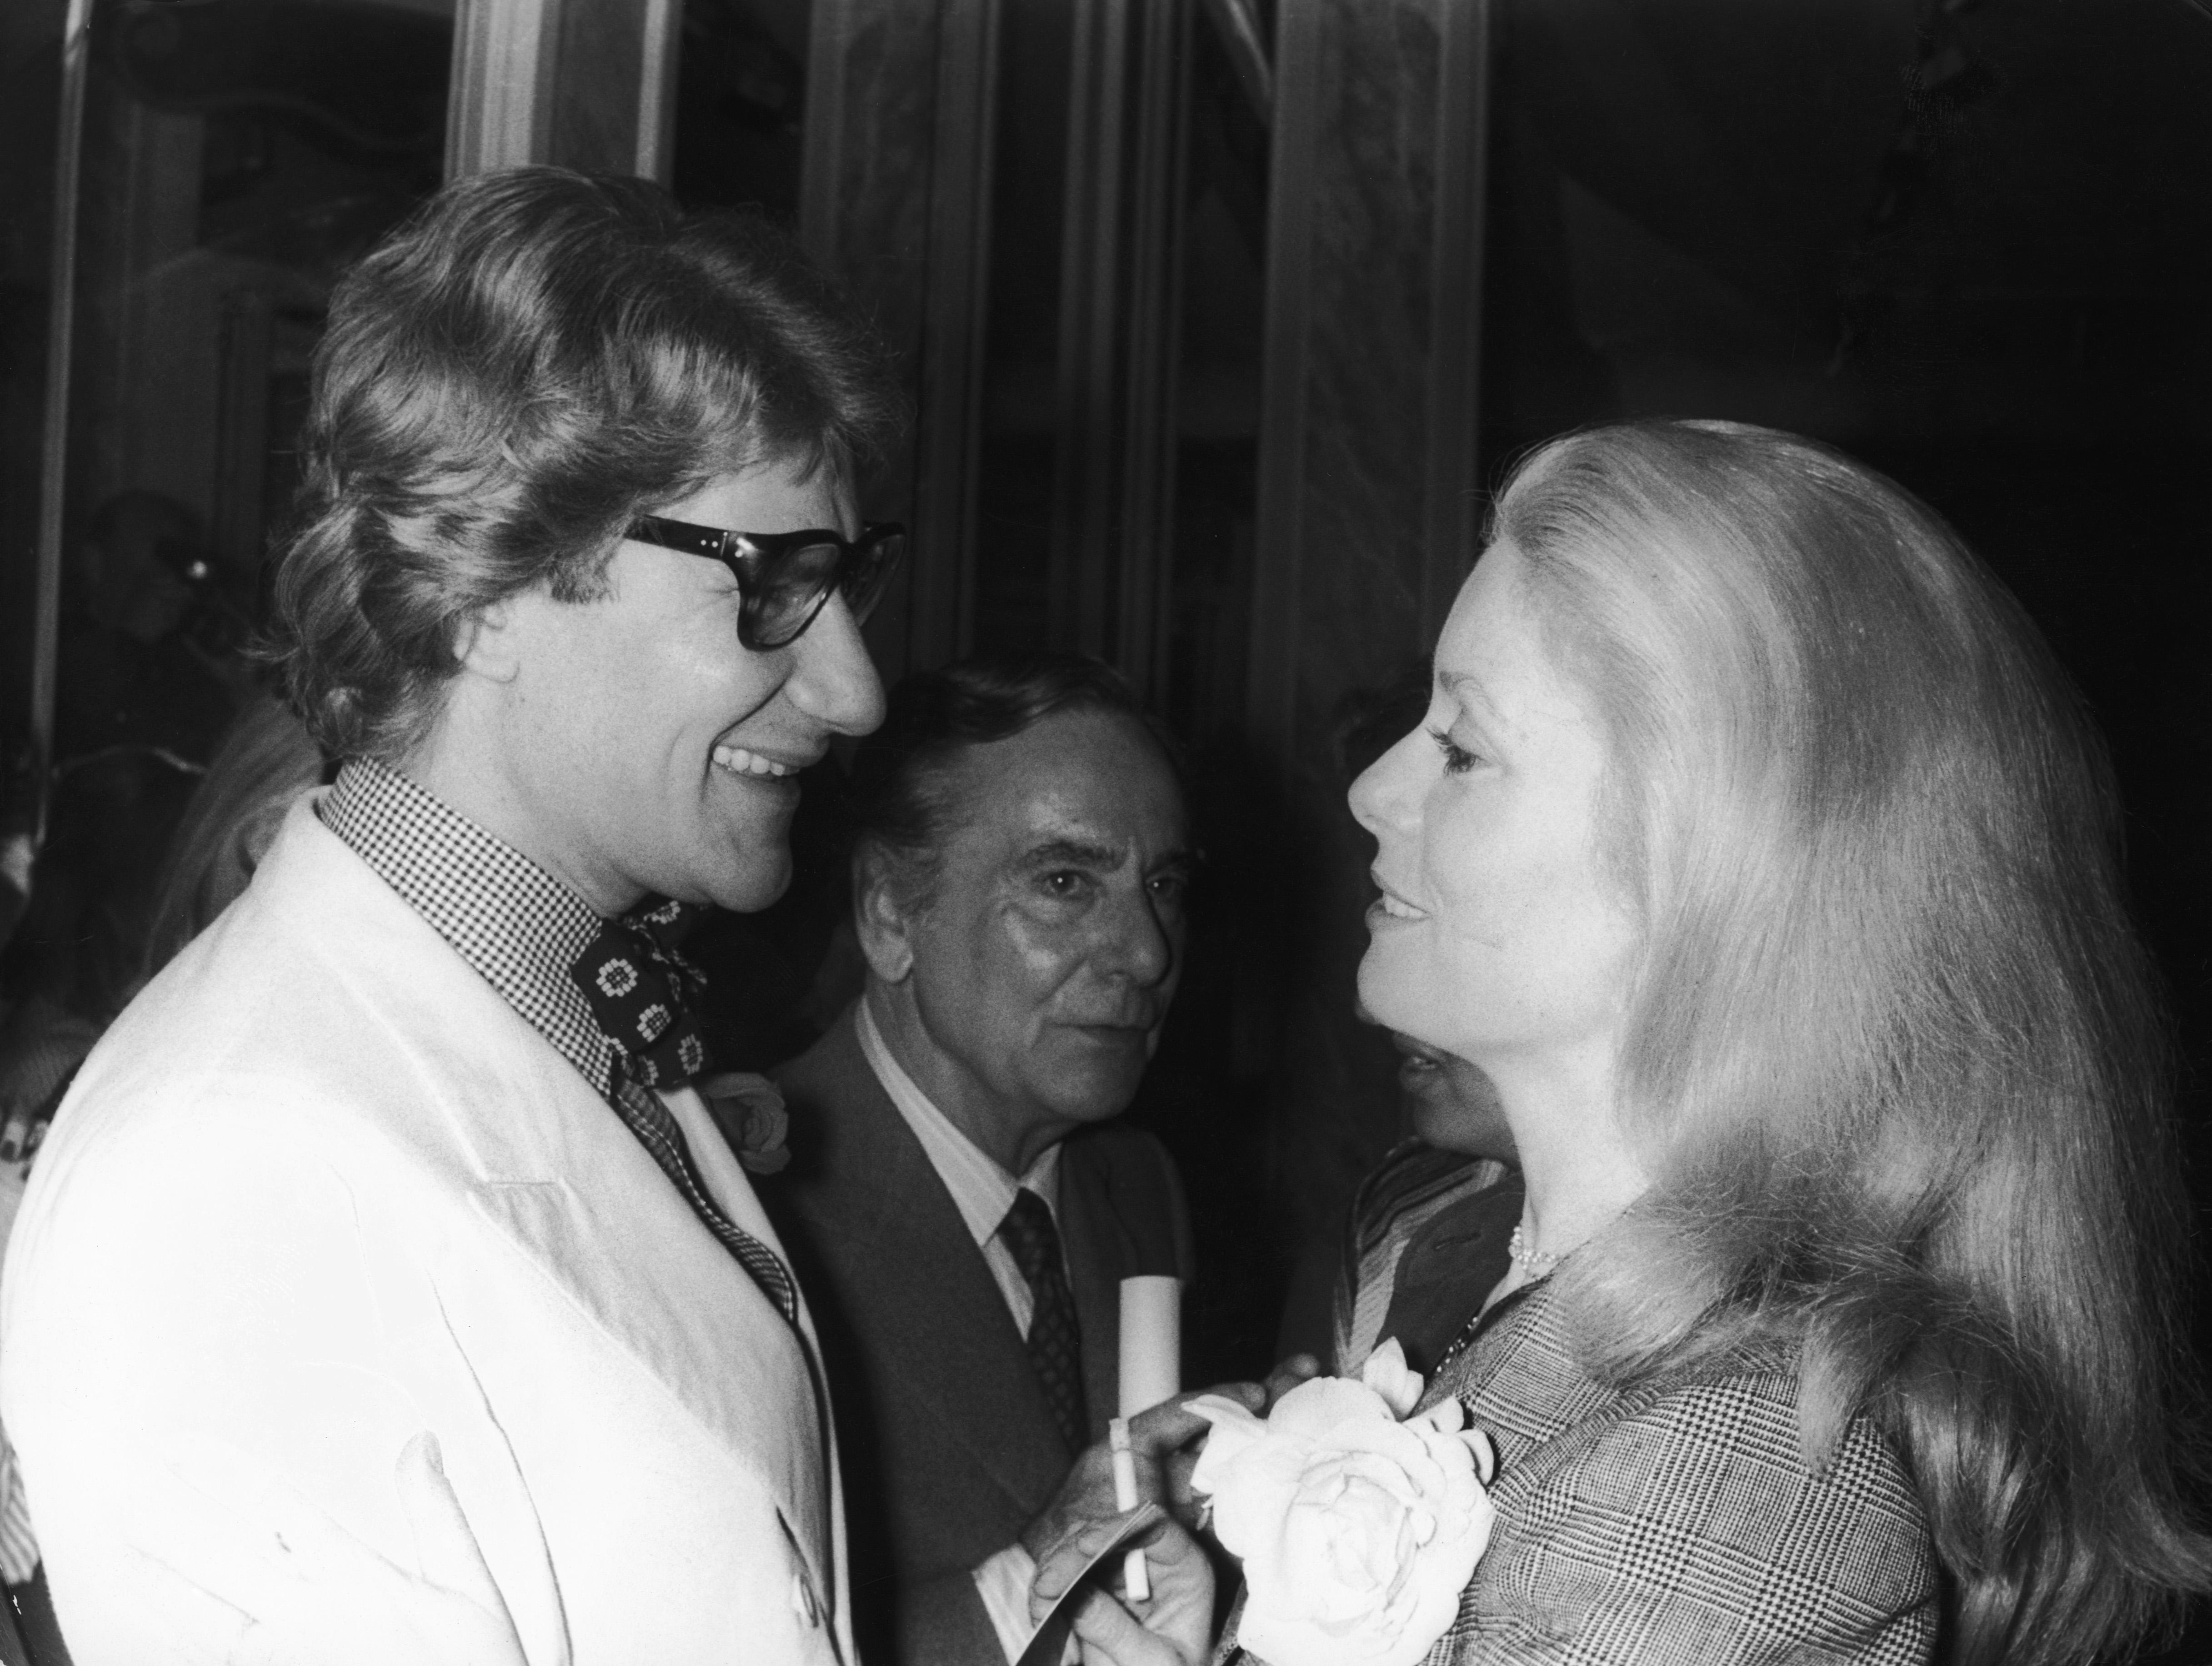 Yves Saint Laurent y Catherine Deneuve, en julio de 1974. (Getty)